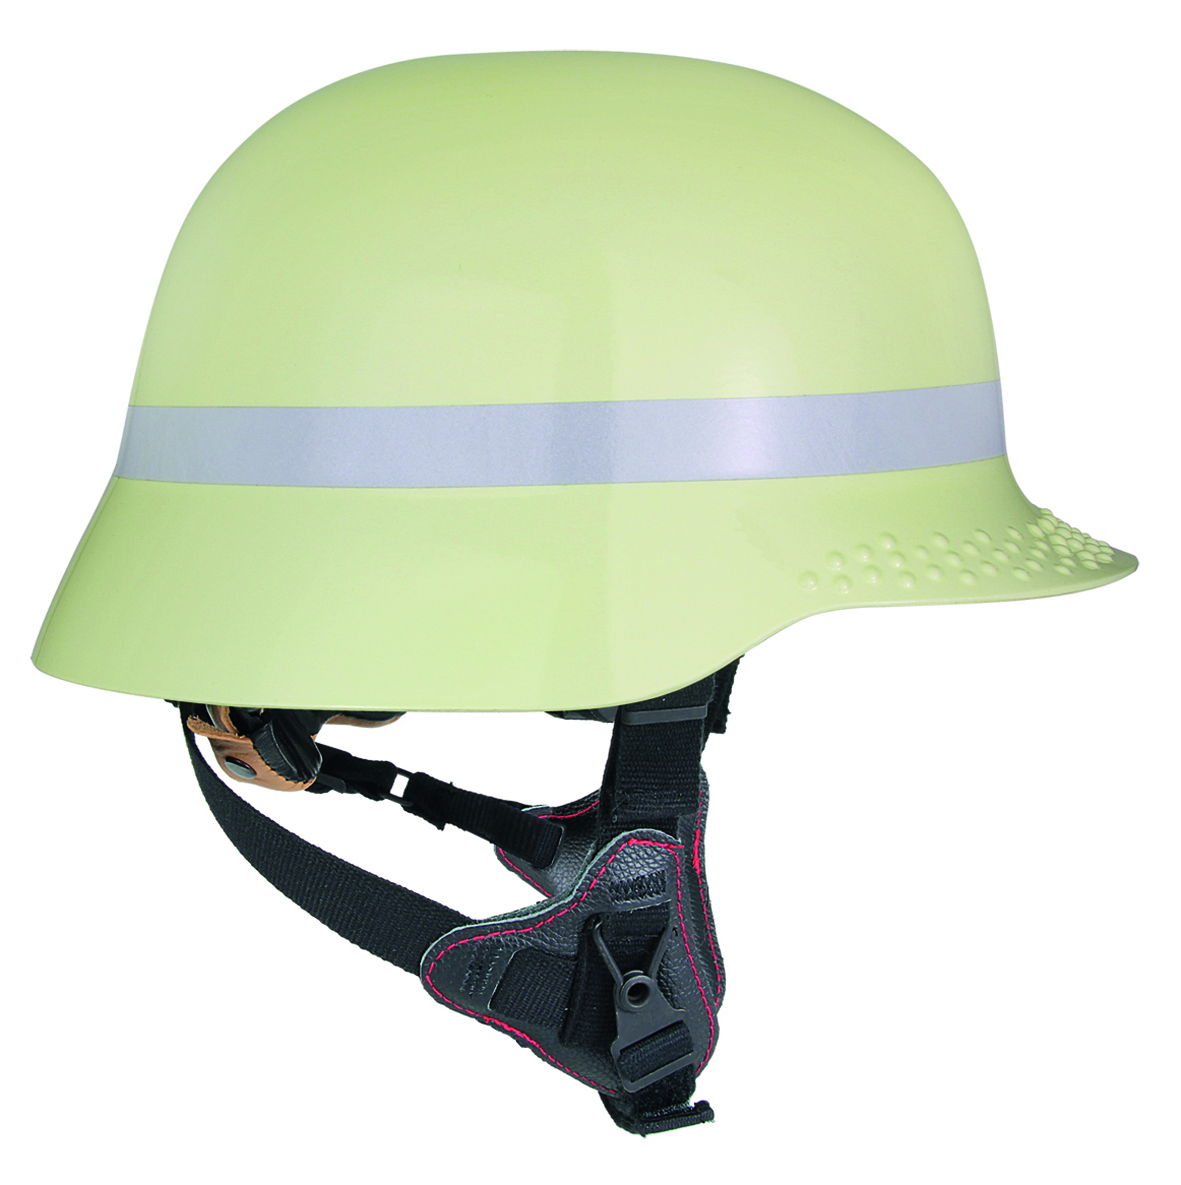 Helm Casco PF 112 extreme, nachtleuchtend, 53 - 64 cm, 1050g